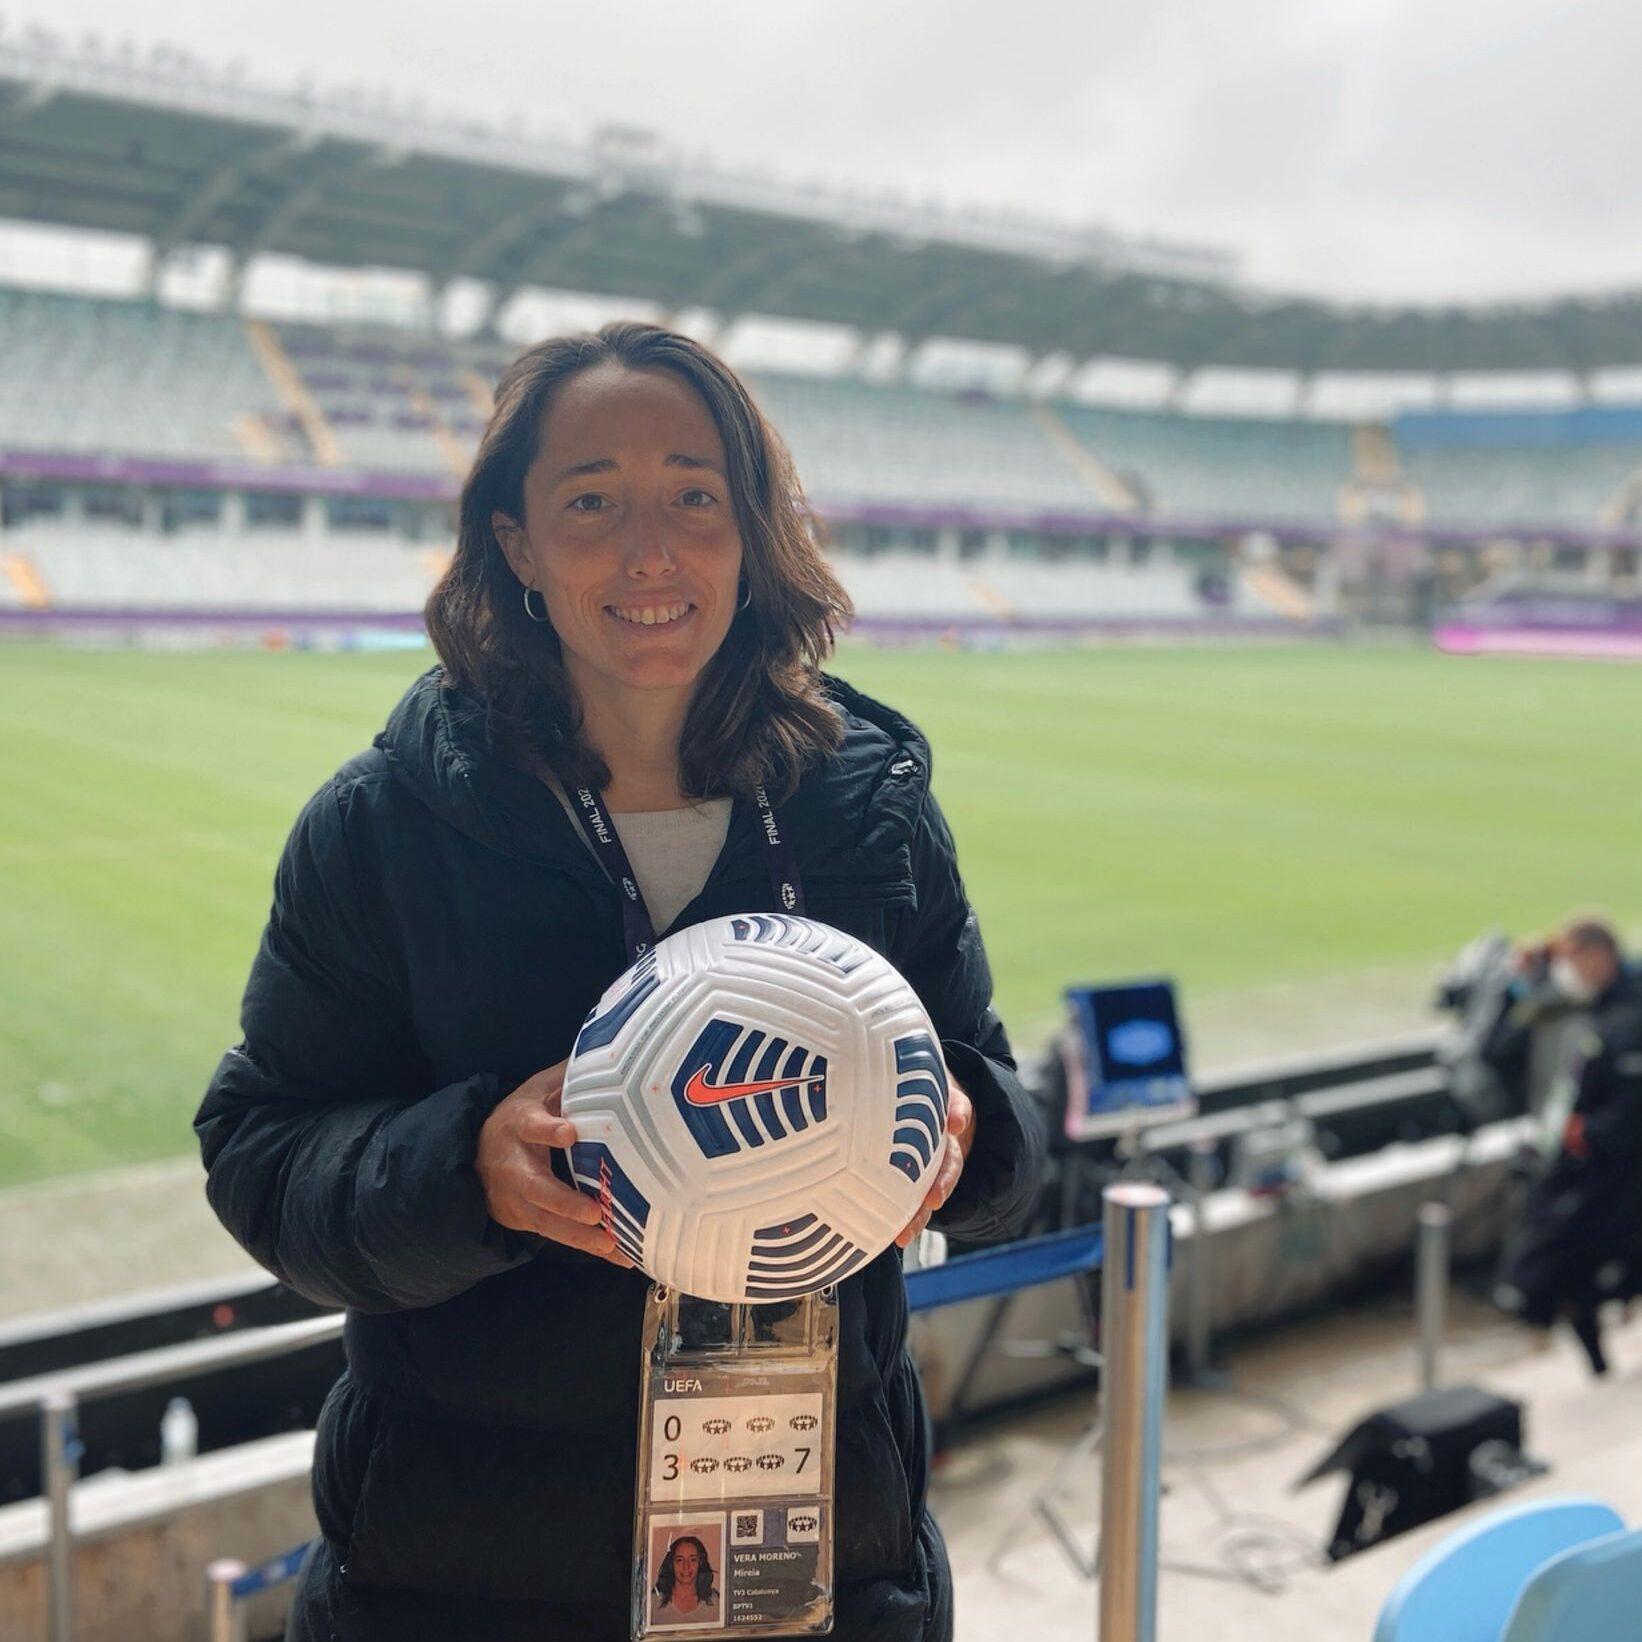 Mireia Vera entrenadora i analista de futbol femení